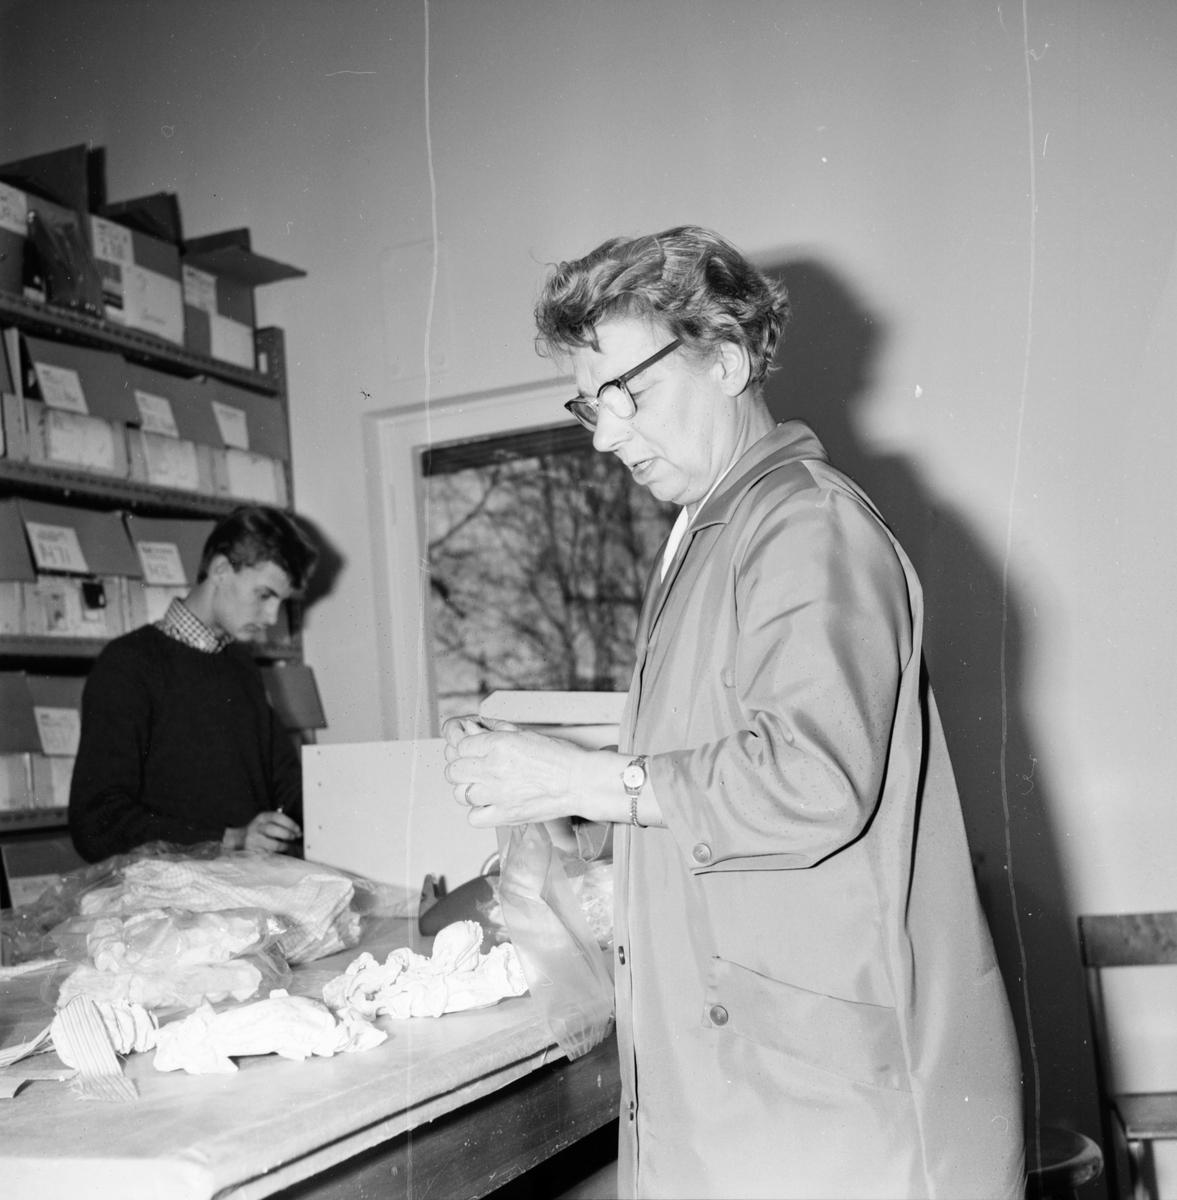 Ramsjö. Jönsson m.fl. 3/11-1965. 1. Gunhild Forsberg, Leif Sundell. 2. Agnes Liback, Inger Gustafsson. 3. Nanna Andersson, Elna Forsmark. 4. Astris Norrby,  Oscar Jönsson. 5.Vidar Forsman, Arne Hård. 6. Gunnar Östling. Postbud.